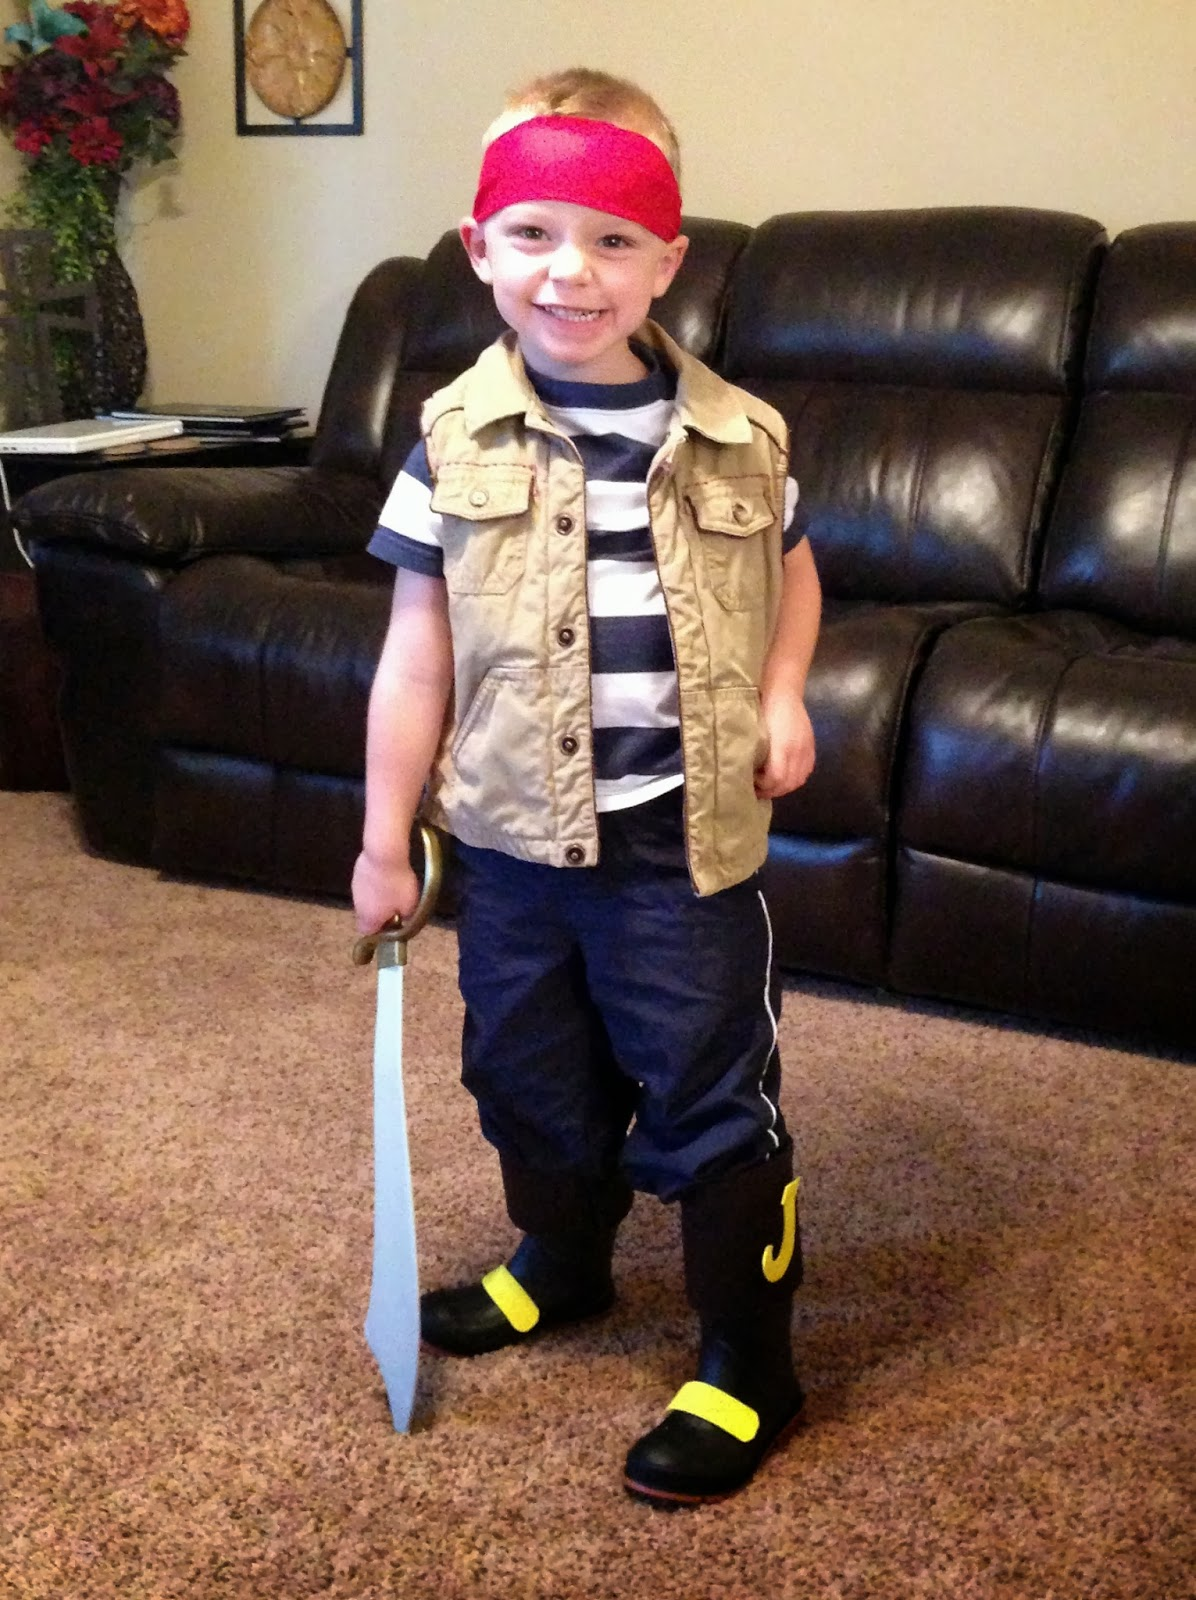 cobo: halloween 2013: jake and the neverland pirates diy costume